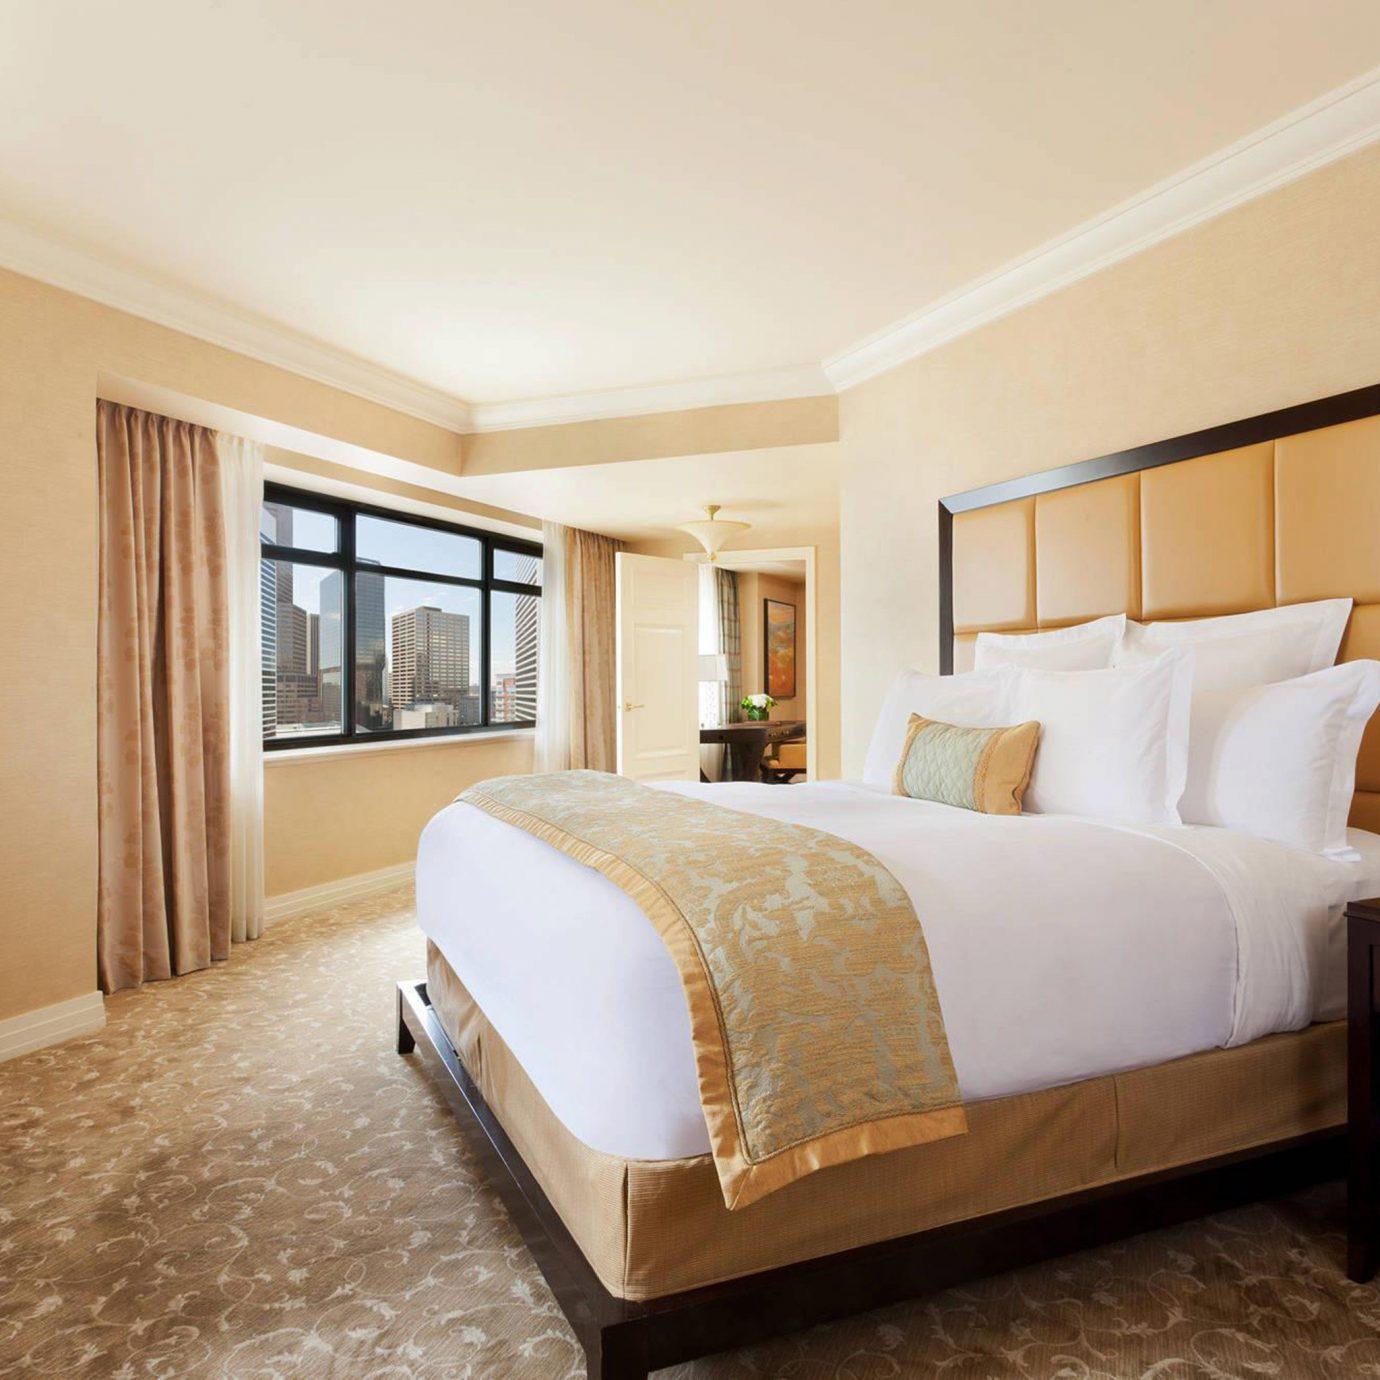 Bedroom Lounge Luxury Romantic Suite property home hardwood cottage living room bed frame